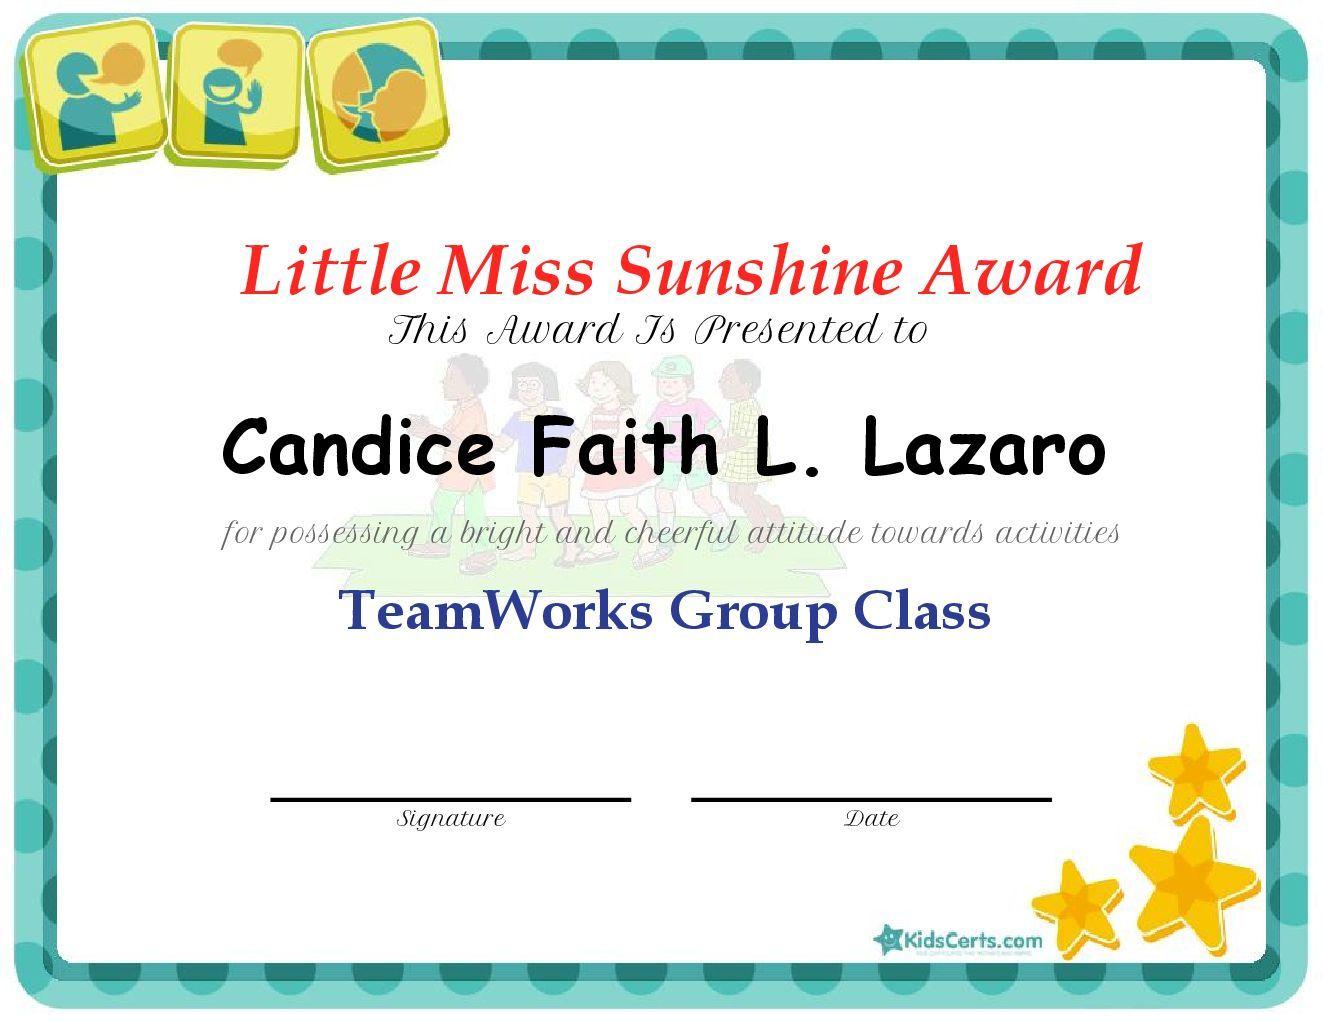 Little miss sunshine award teamworks group class certificate little miss sunshine award teamworks group class xflitez Choice Image